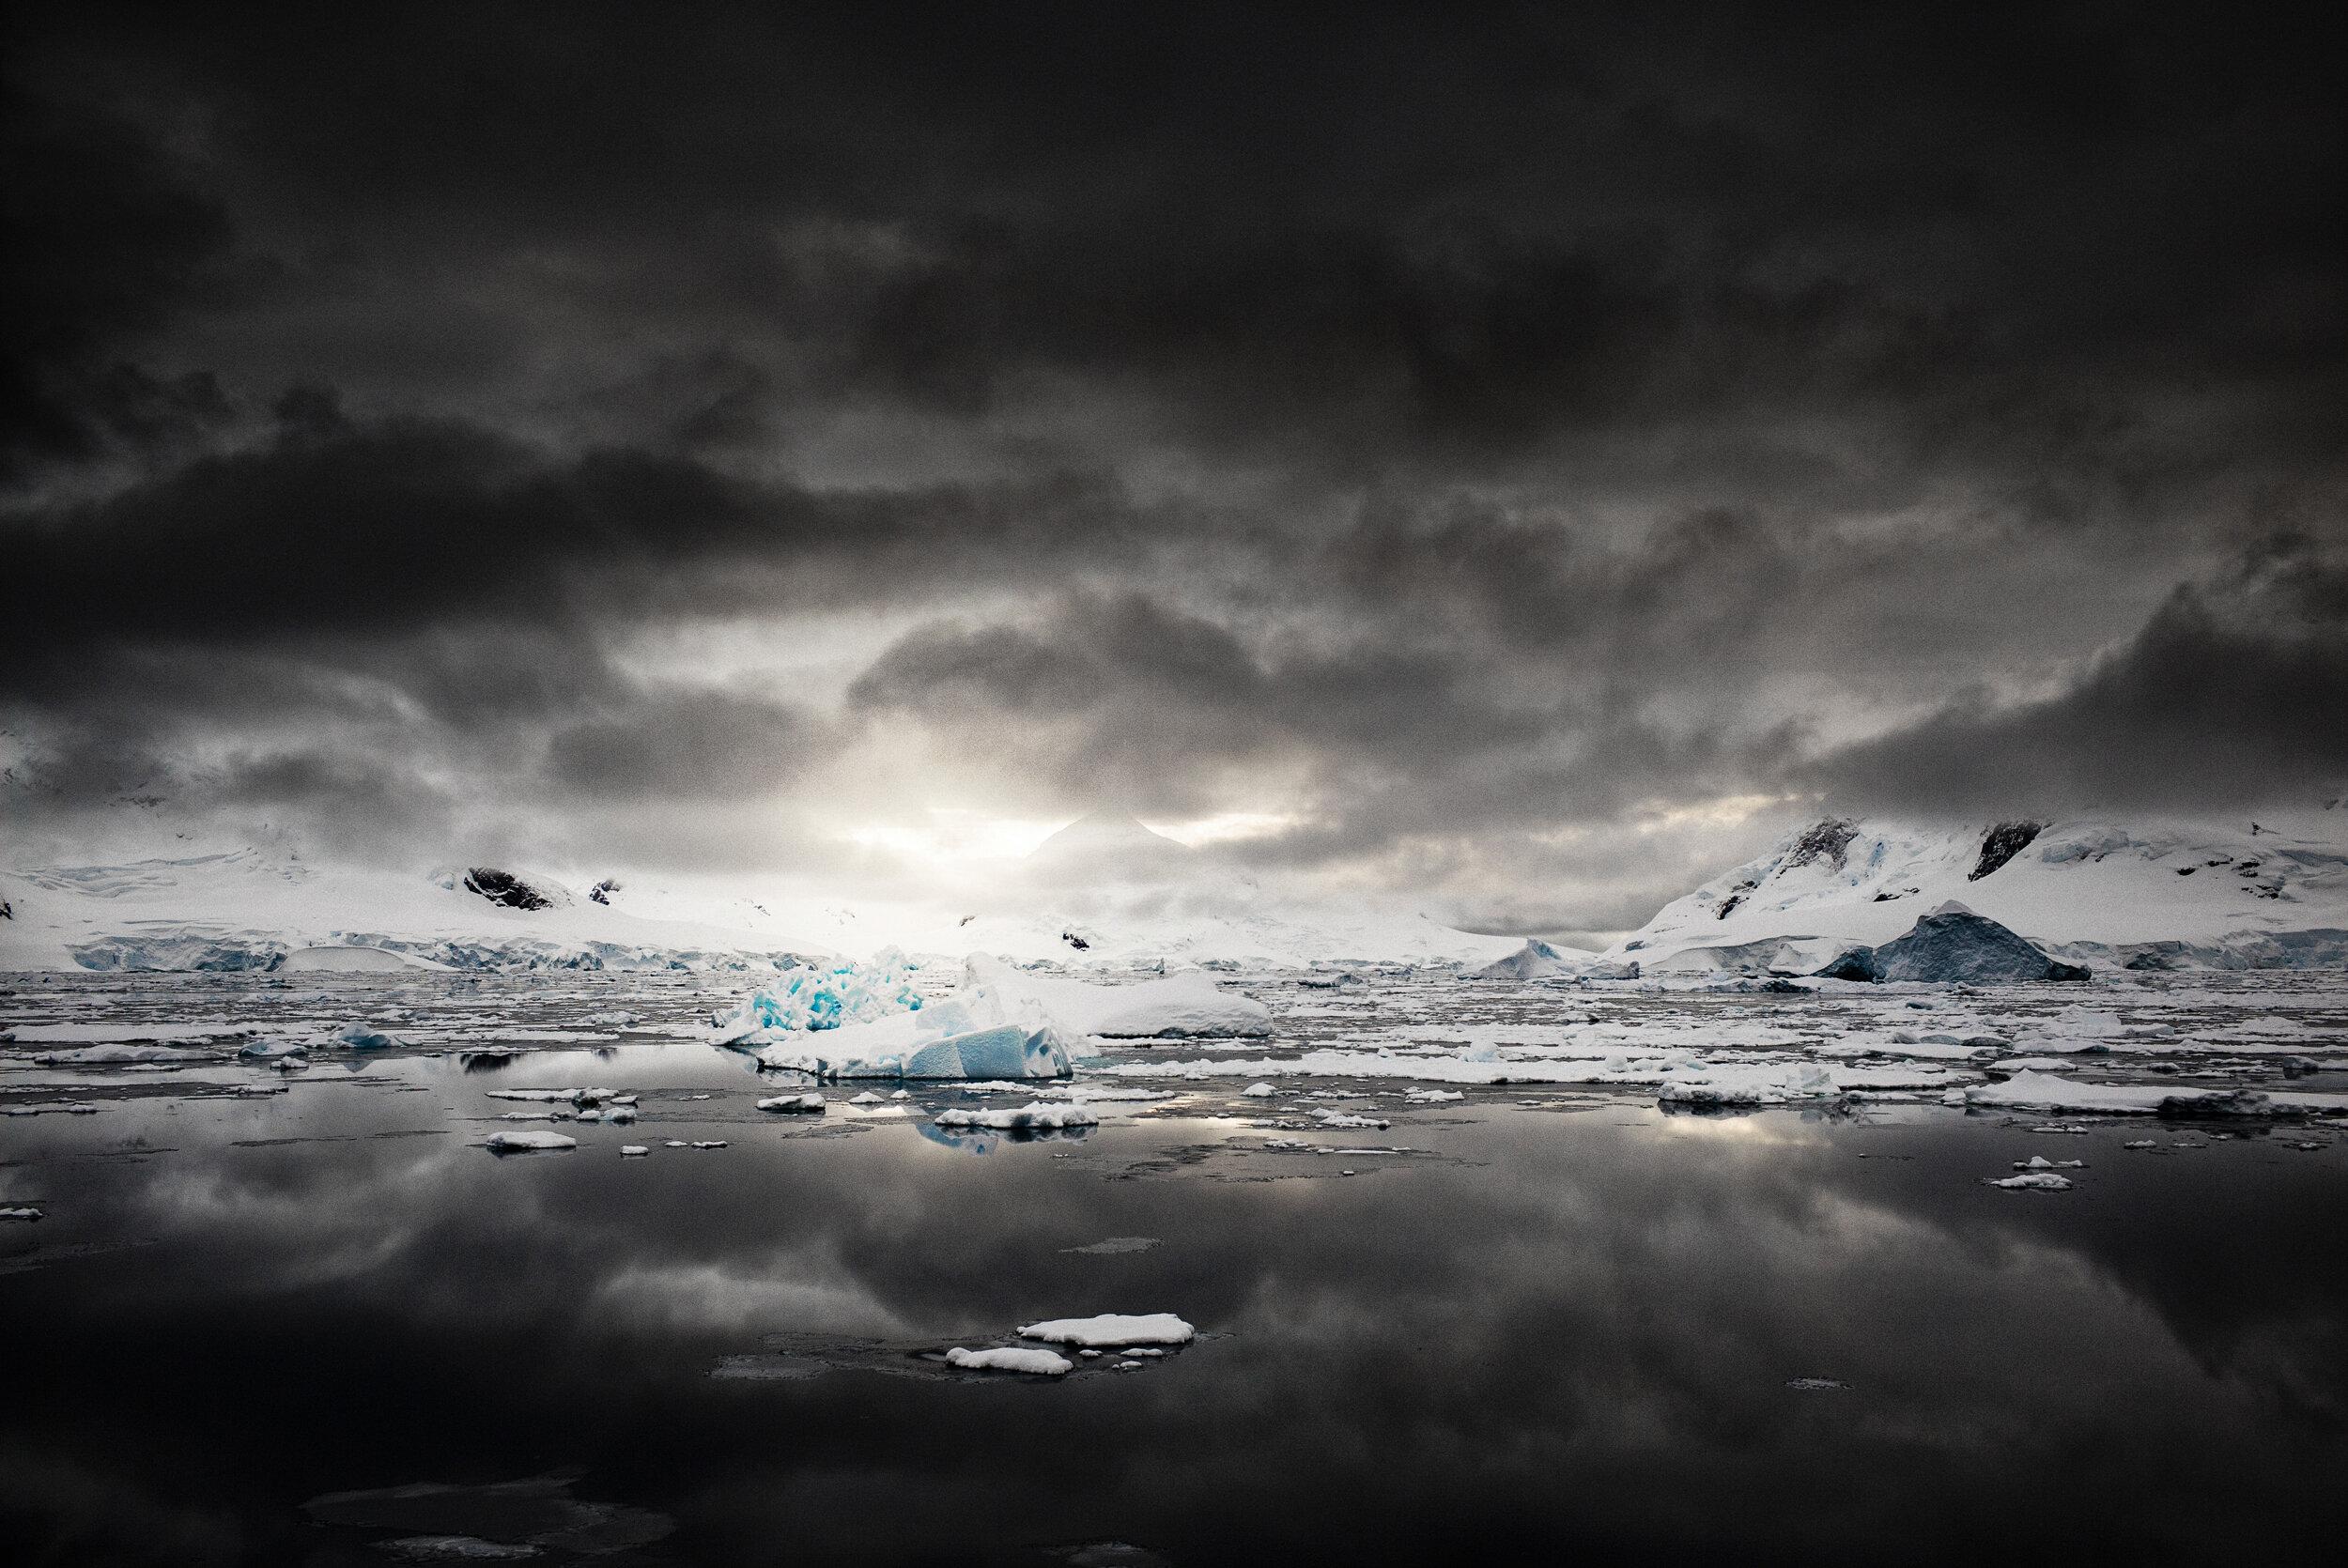 manuel_uebler_antarctica_twilight_011.jpg